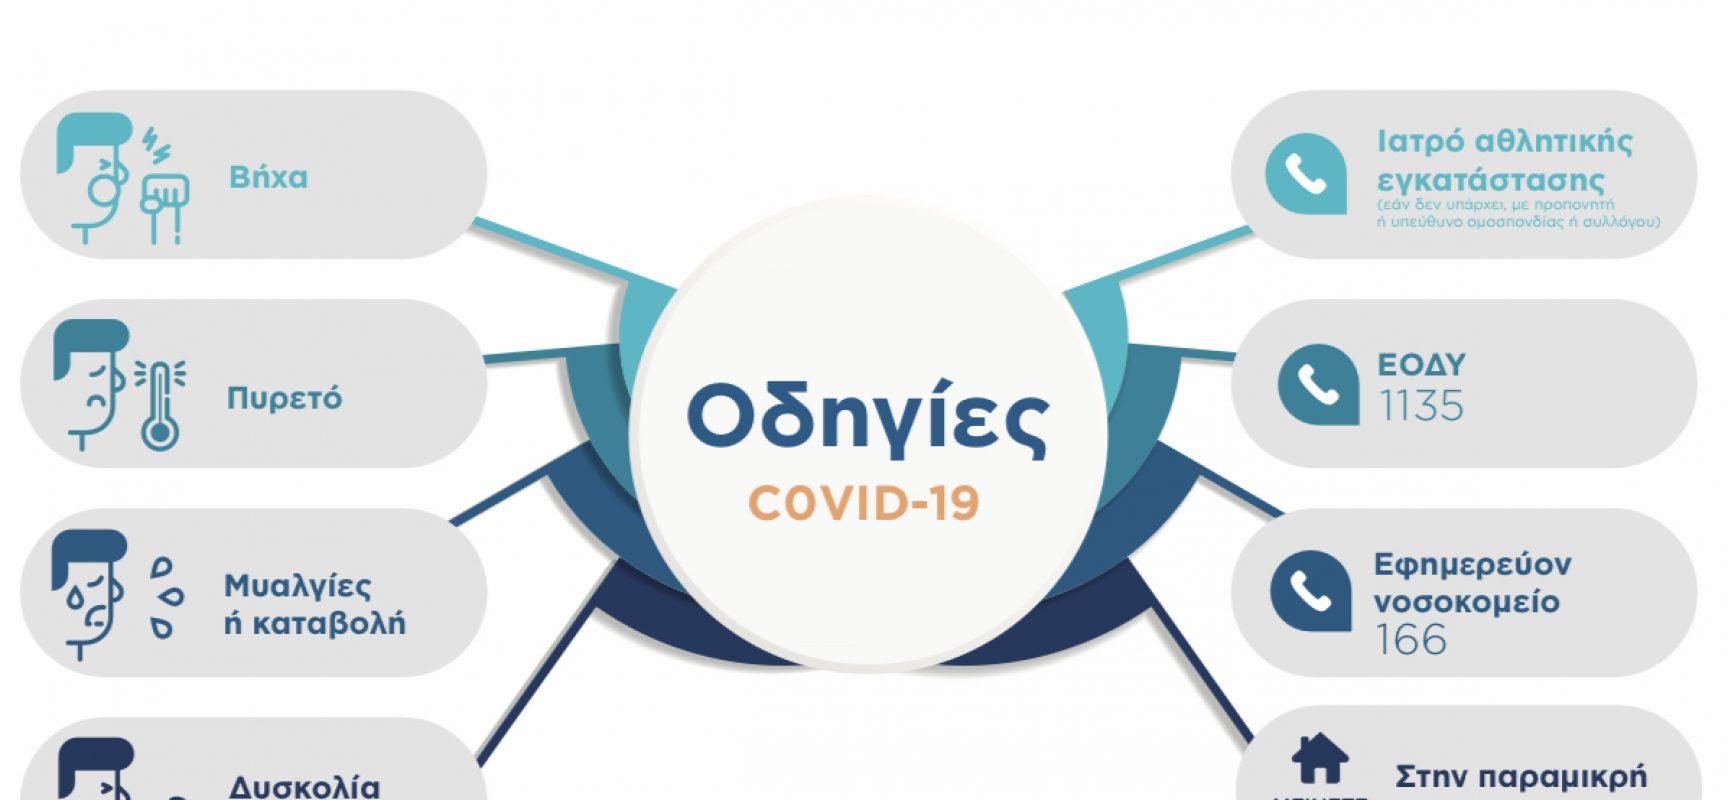 Oι οδηγίες και τα έγγραφα της ΓΓΑ για τον COVID – 19